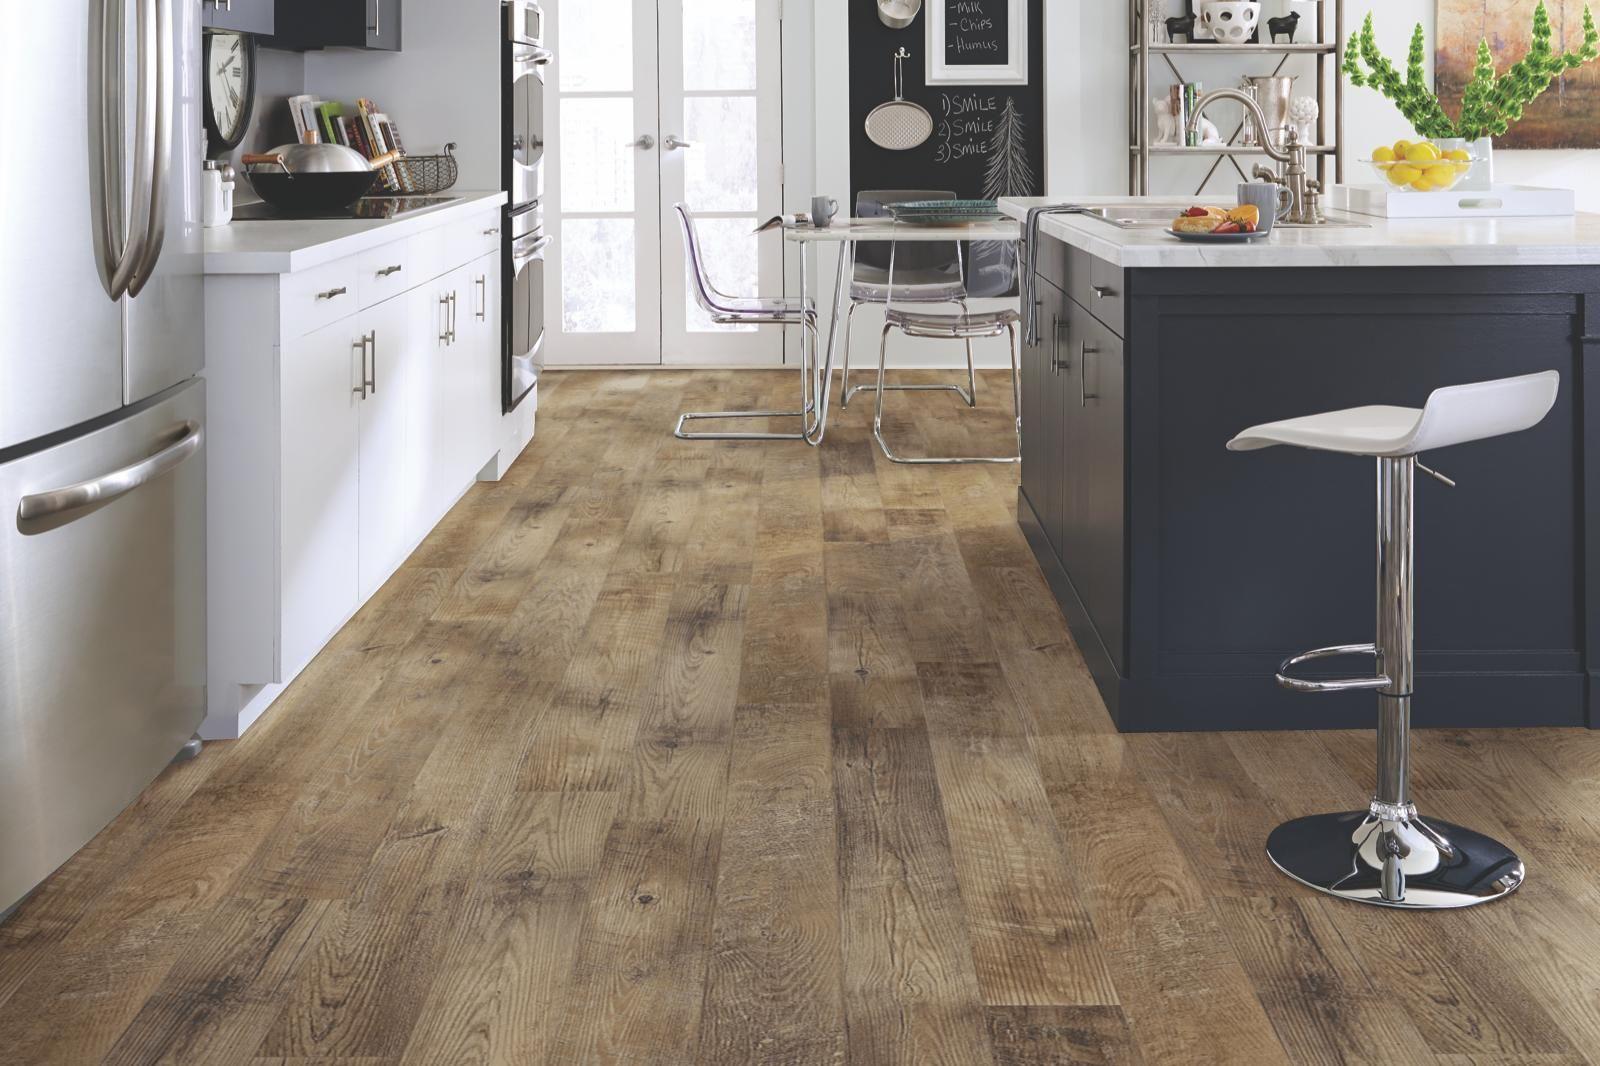 Mannington Dockside Sand Lvt Flooring House Kitchen